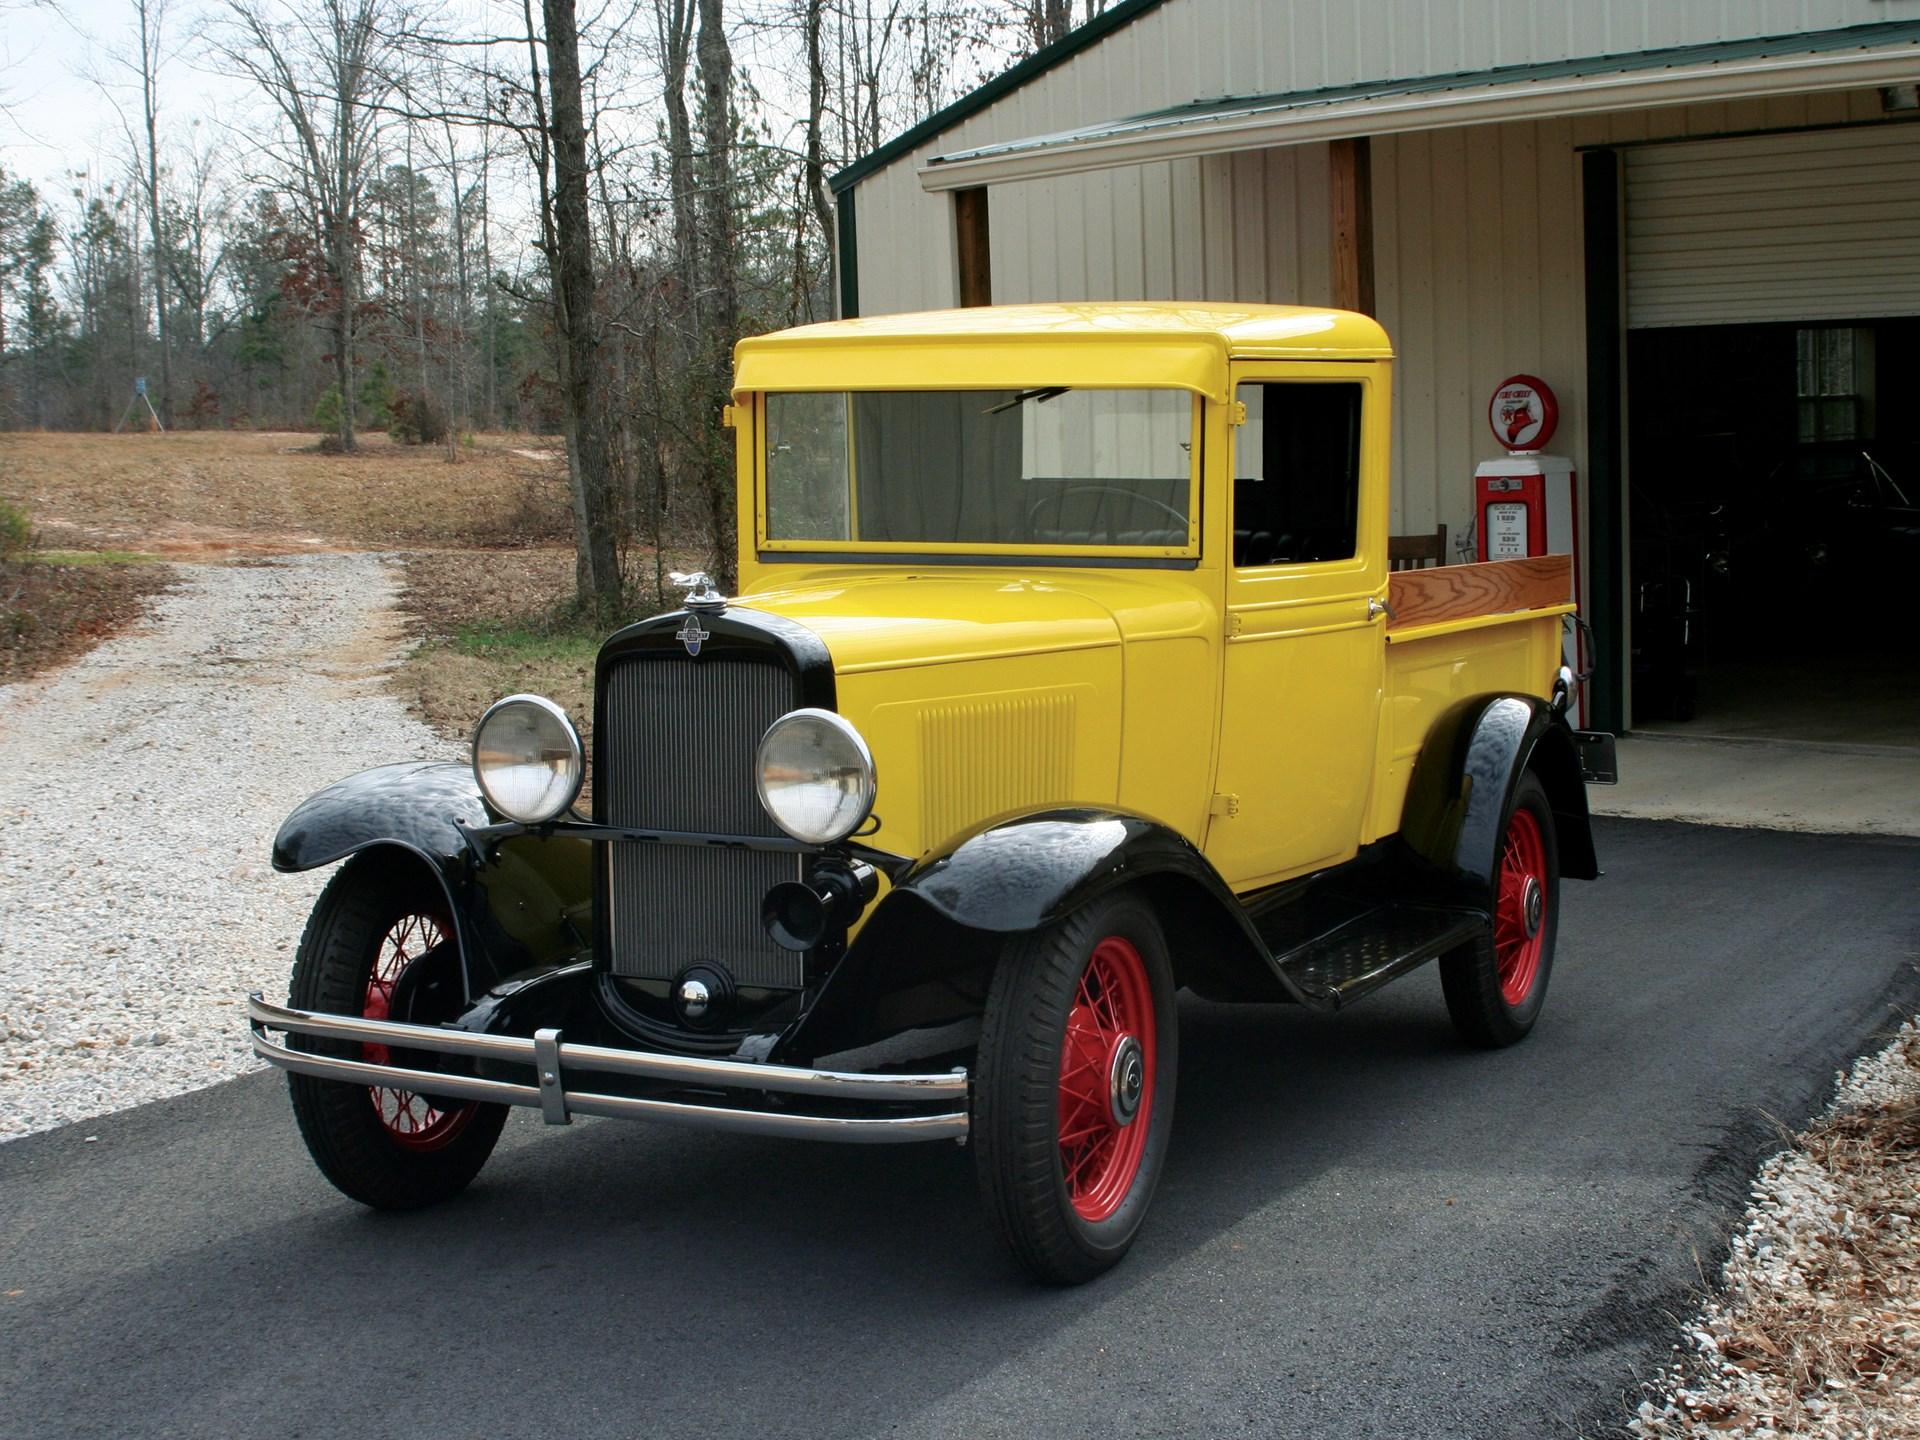 RM Sotheby's - 1931 Chevrolet 1/2 Ton Pickup | Vintage Motor ...